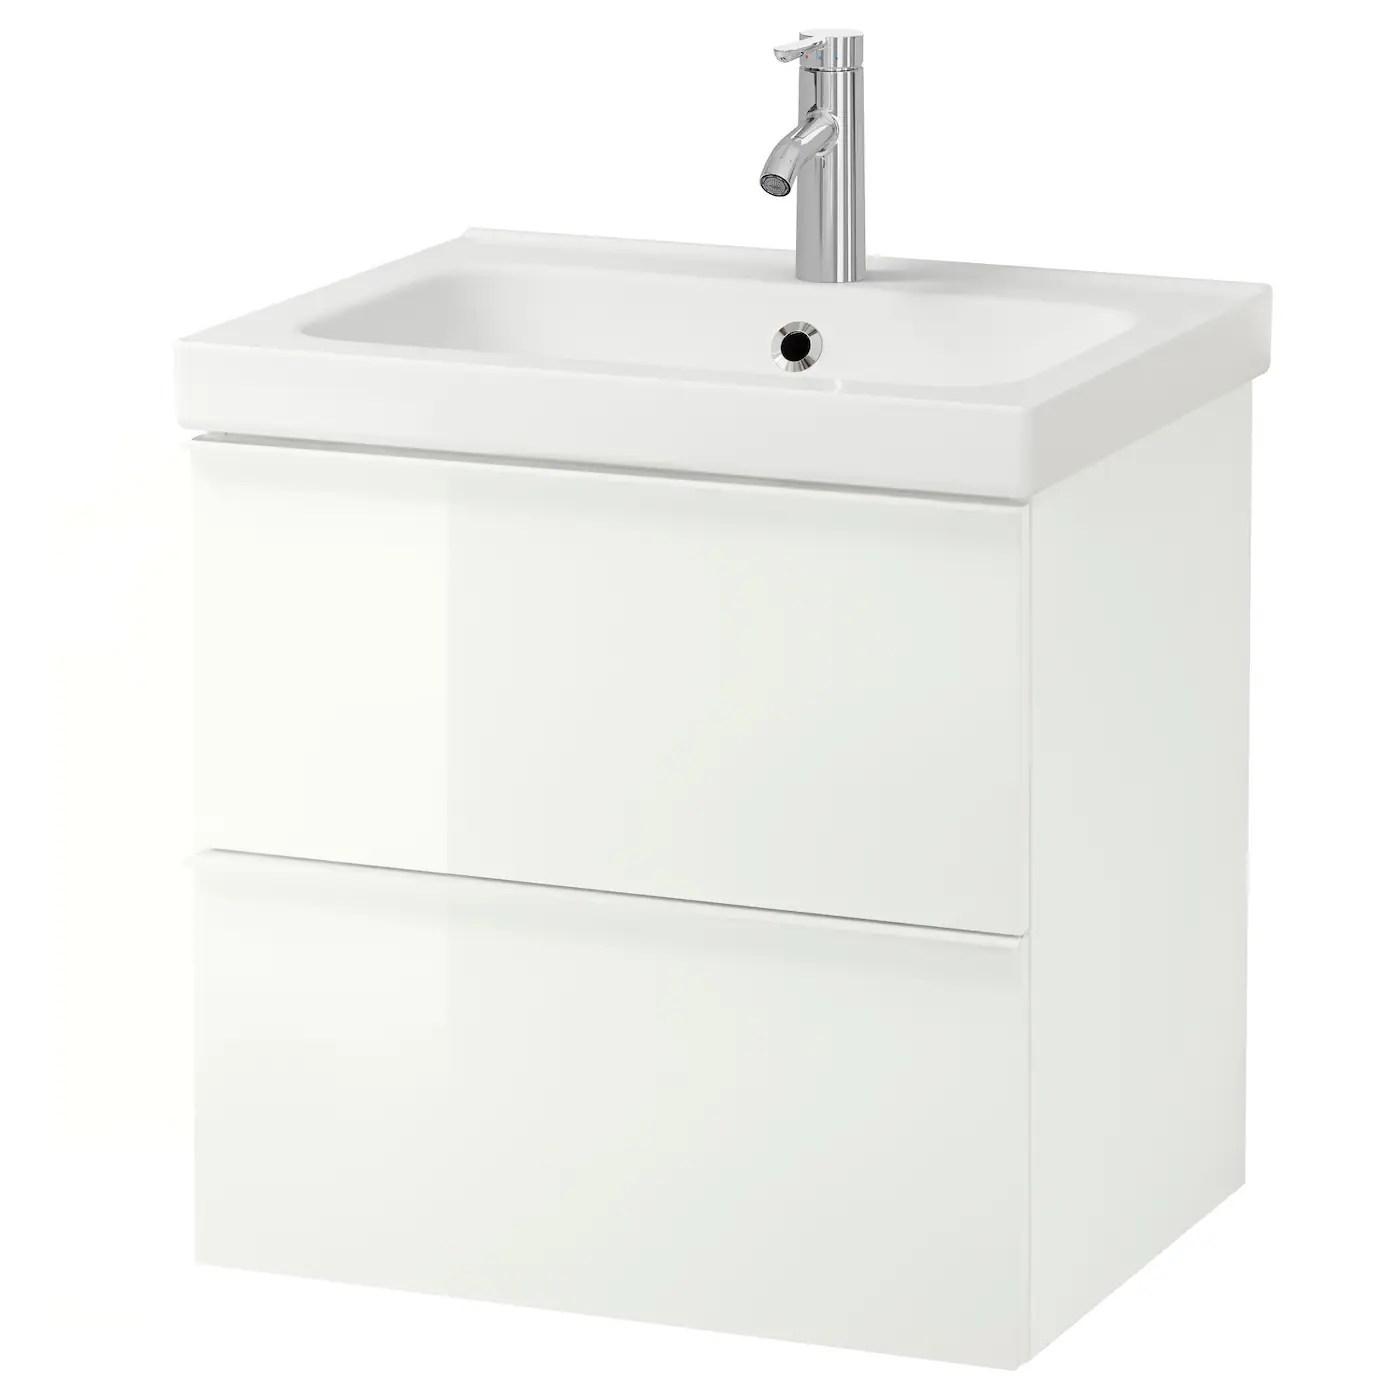 Godmorgon Odensvik Meuble Lavabo 2tir Brillant Blanc Dalskar Mitigeur Lavabo 63x49x64 Cm Ikea